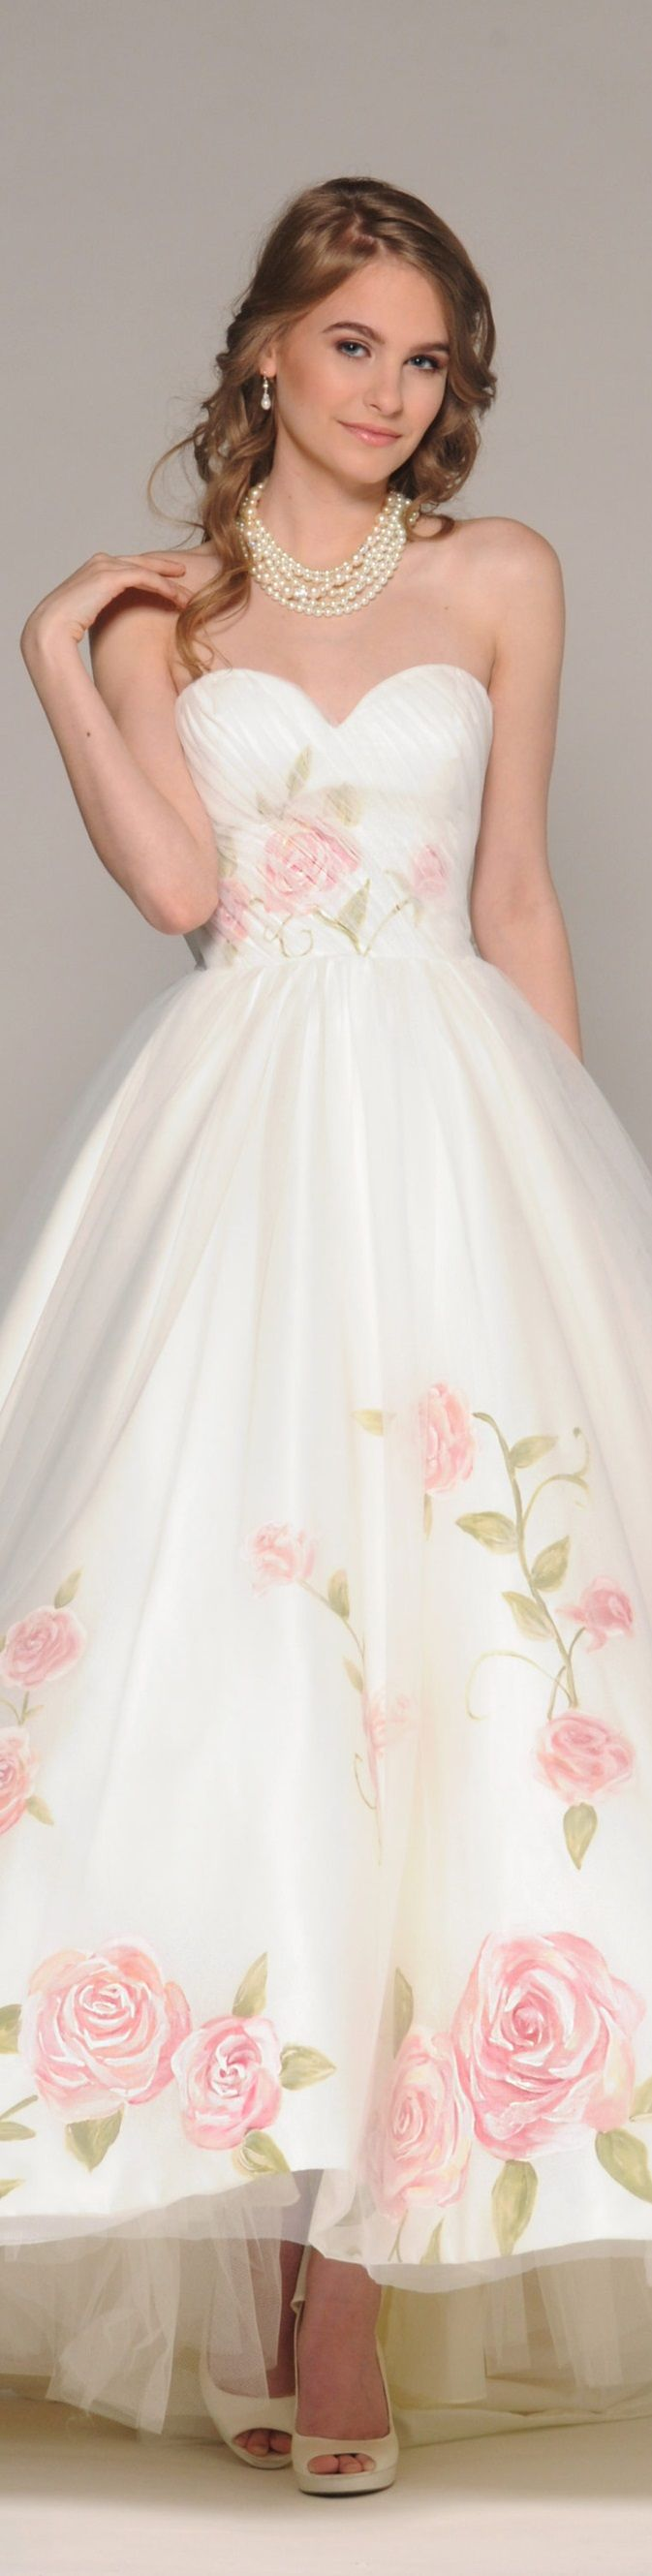 best wedding dress images on pinterest bridal gowns dream